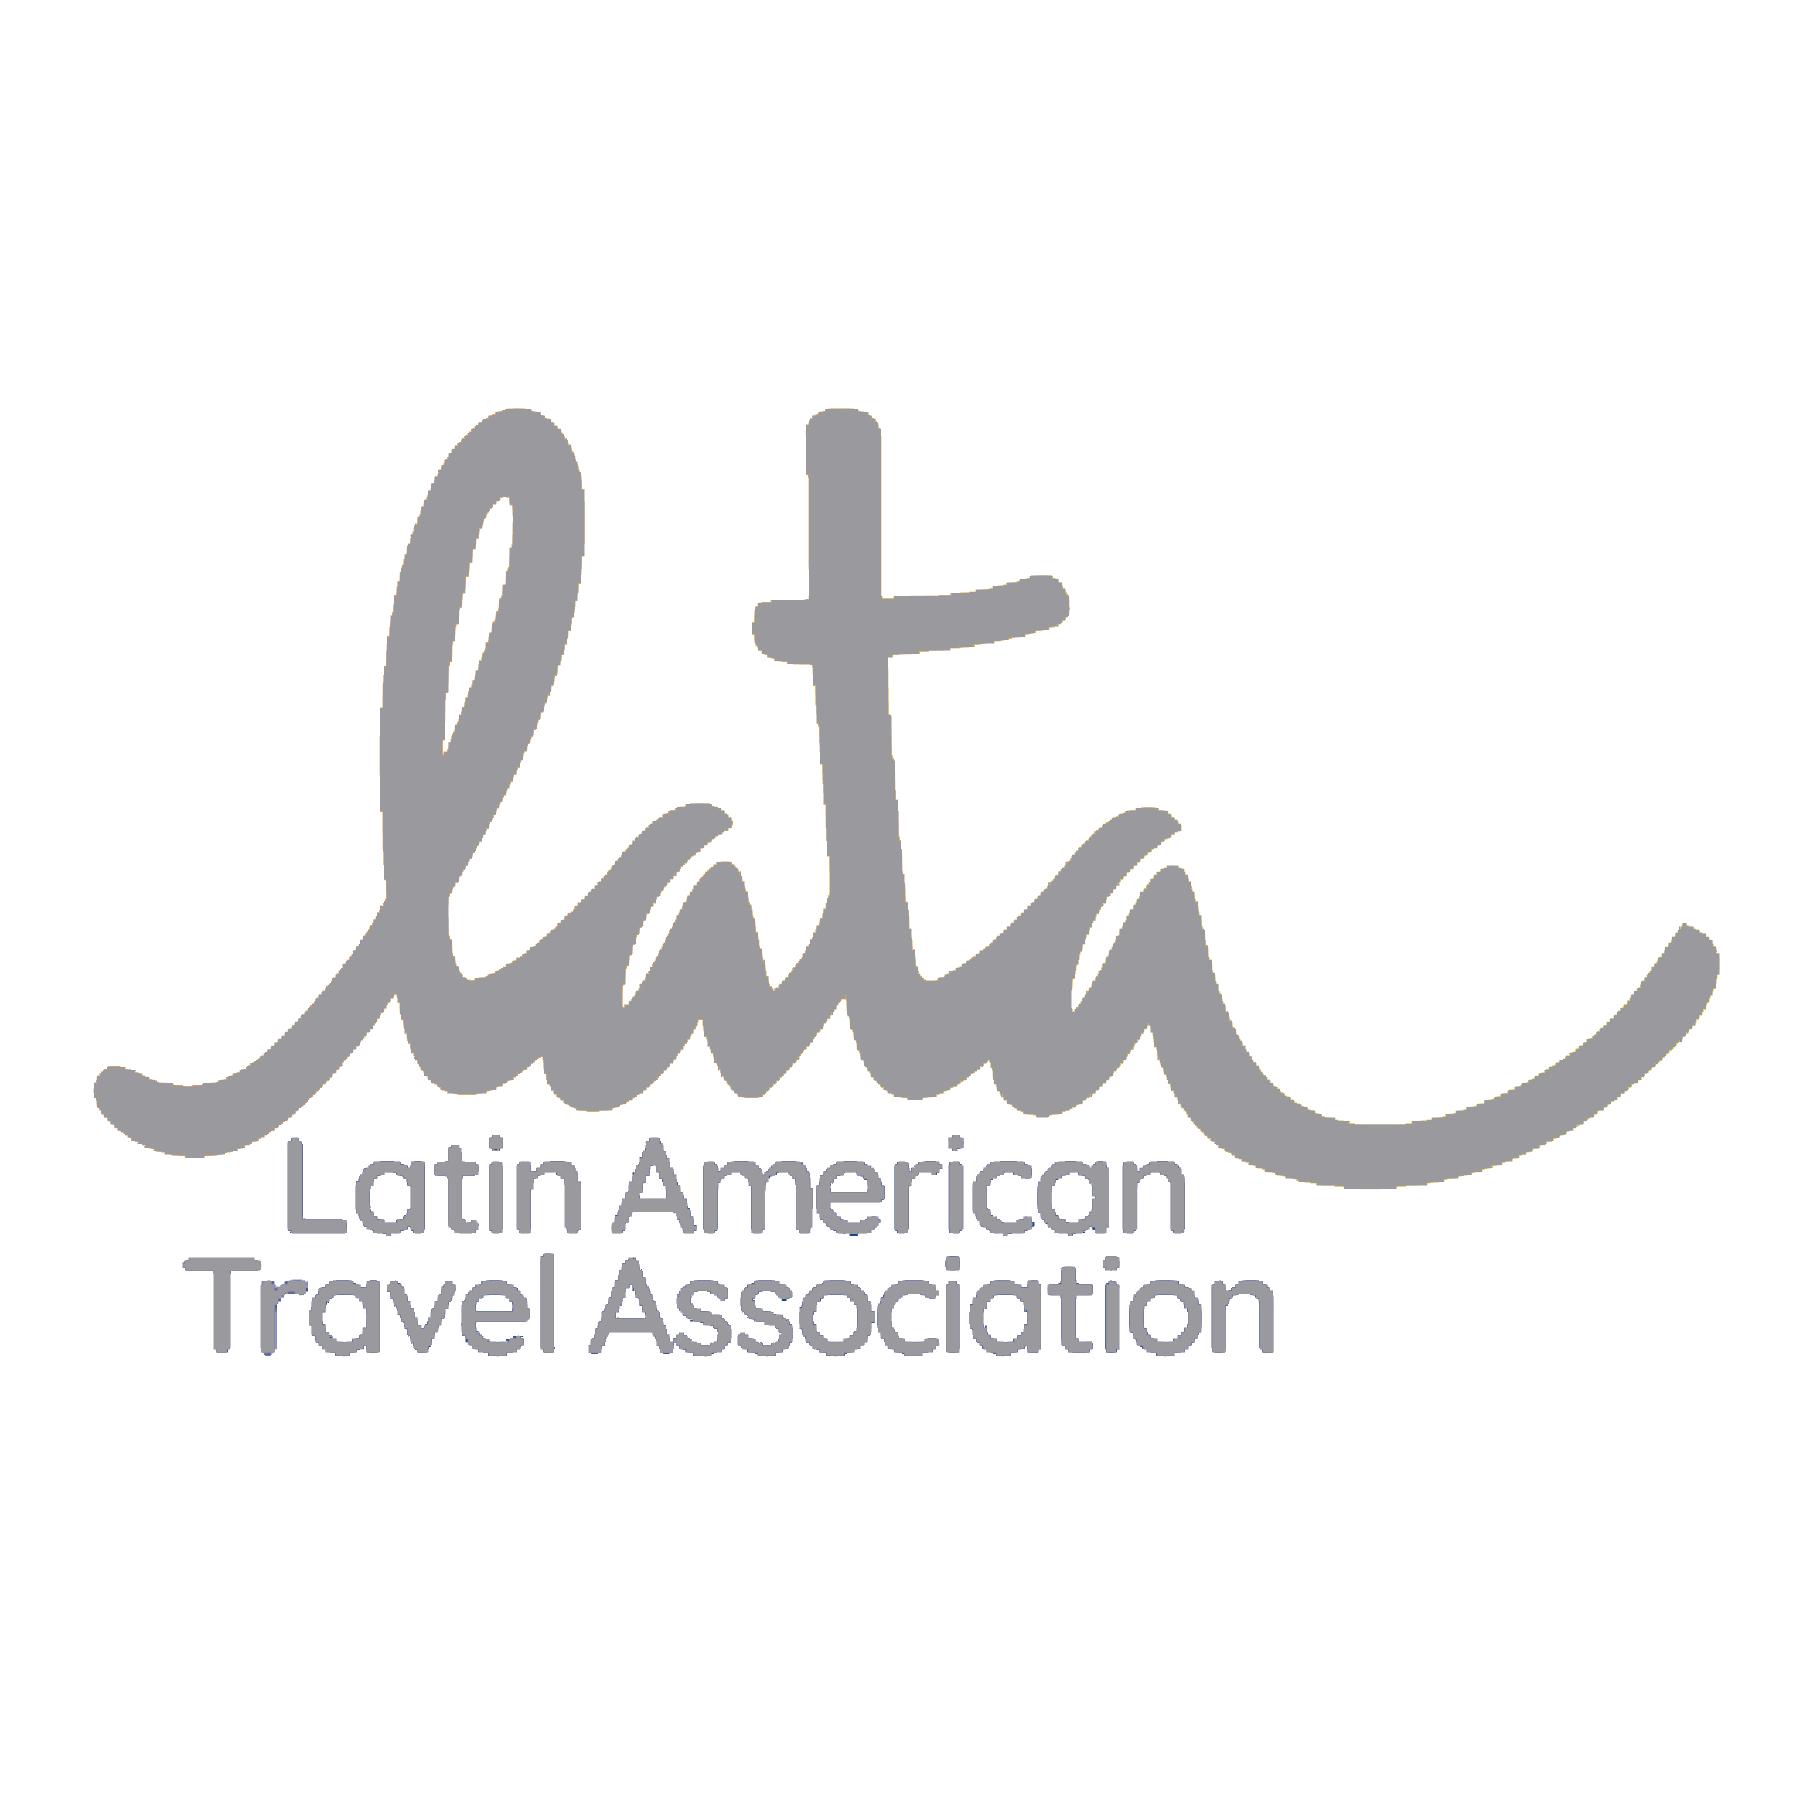 https://www.lata.travel/